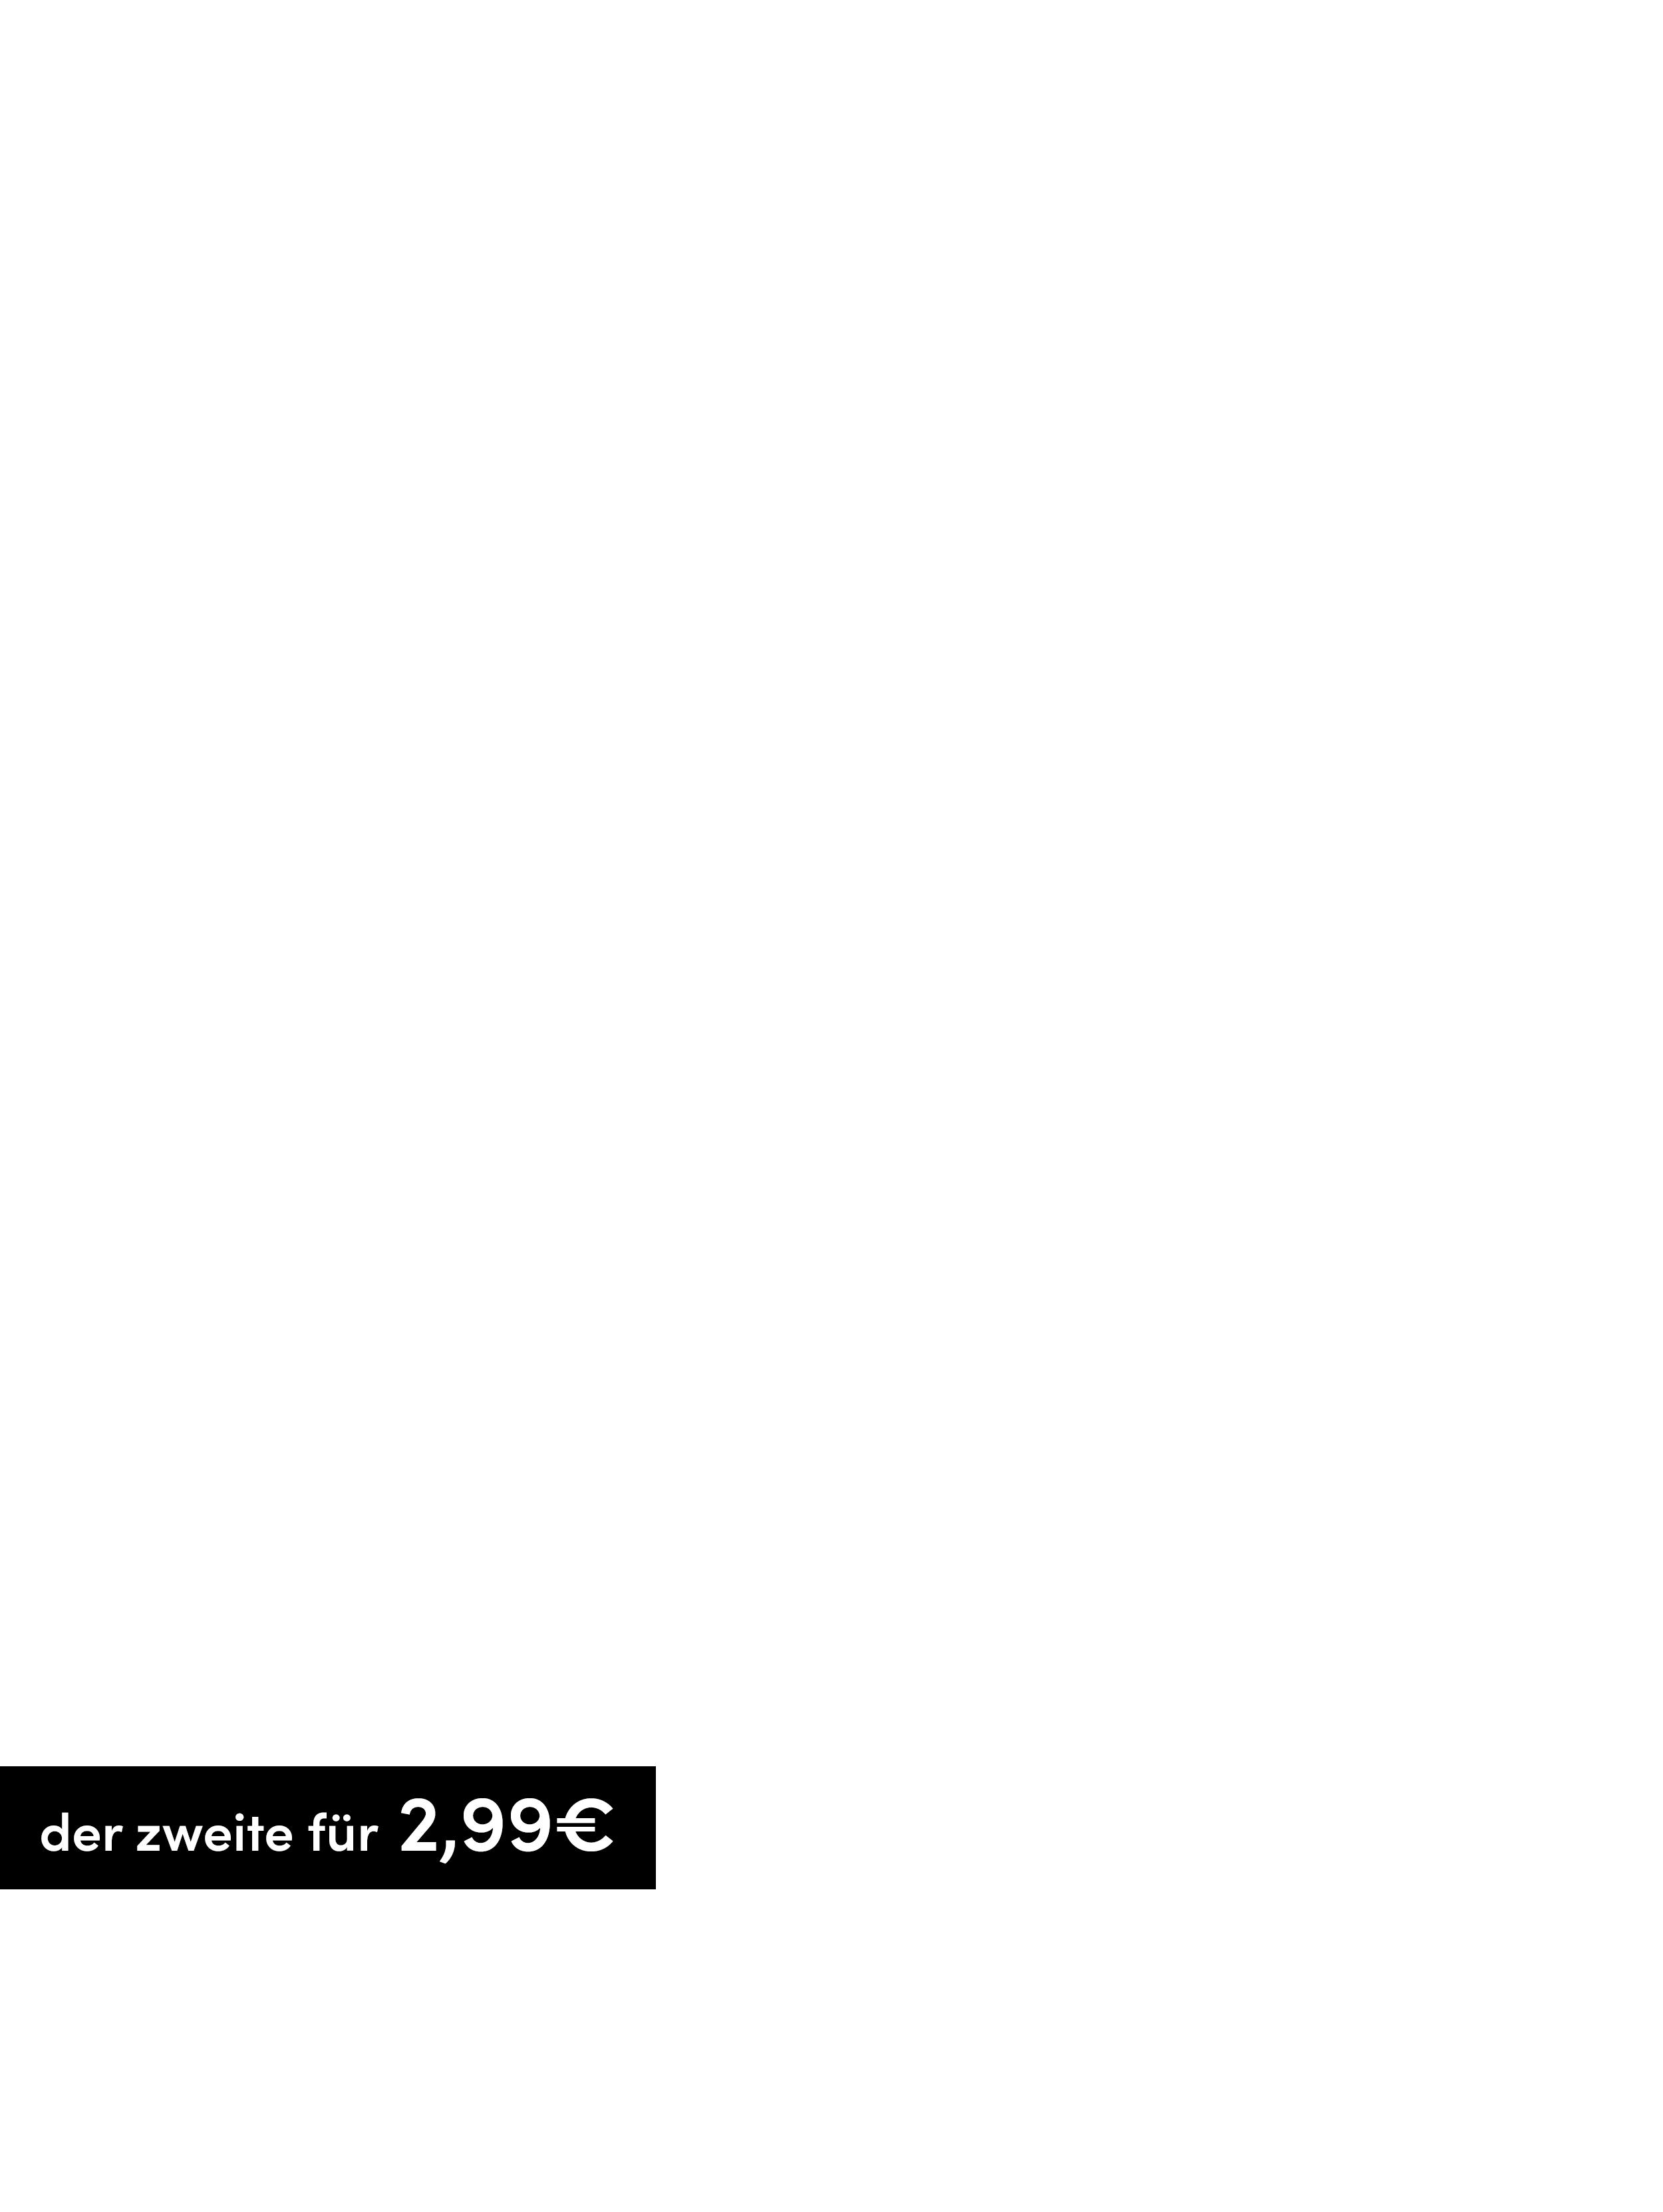 GER_ secondo a 2.99€